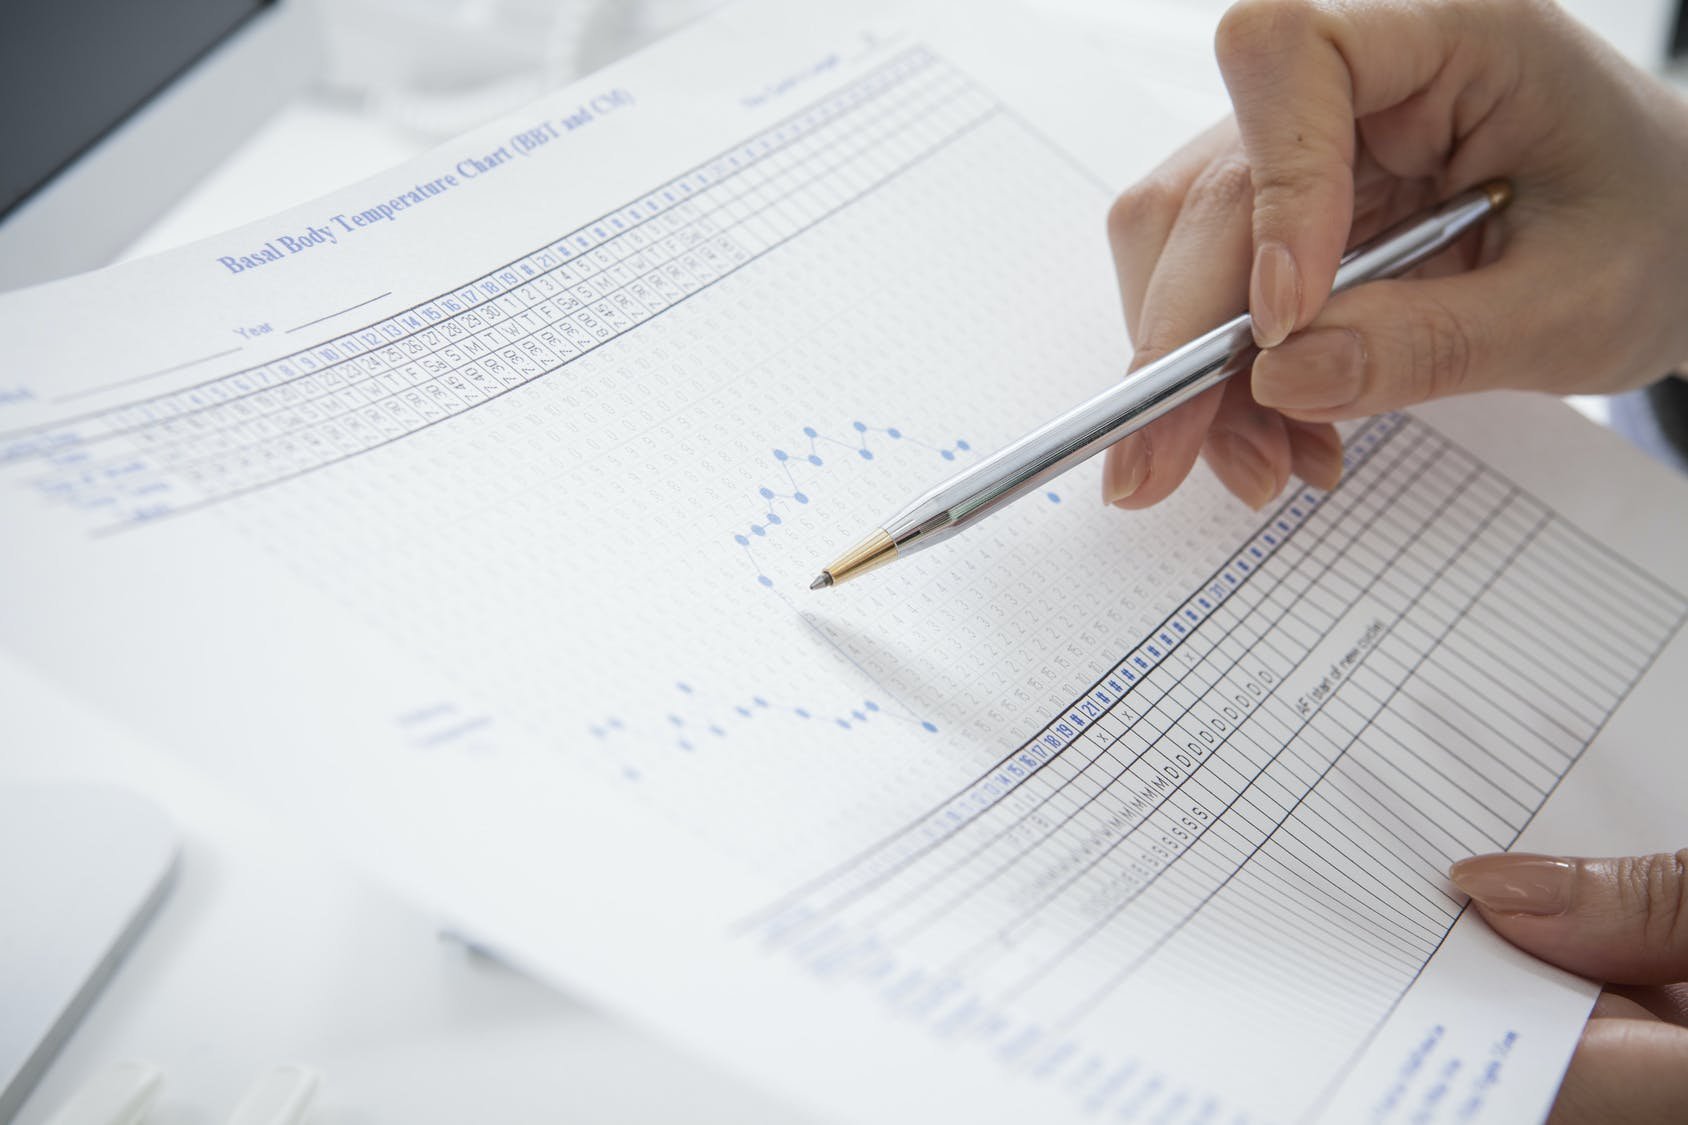 Les tests d'ovulation en pratique